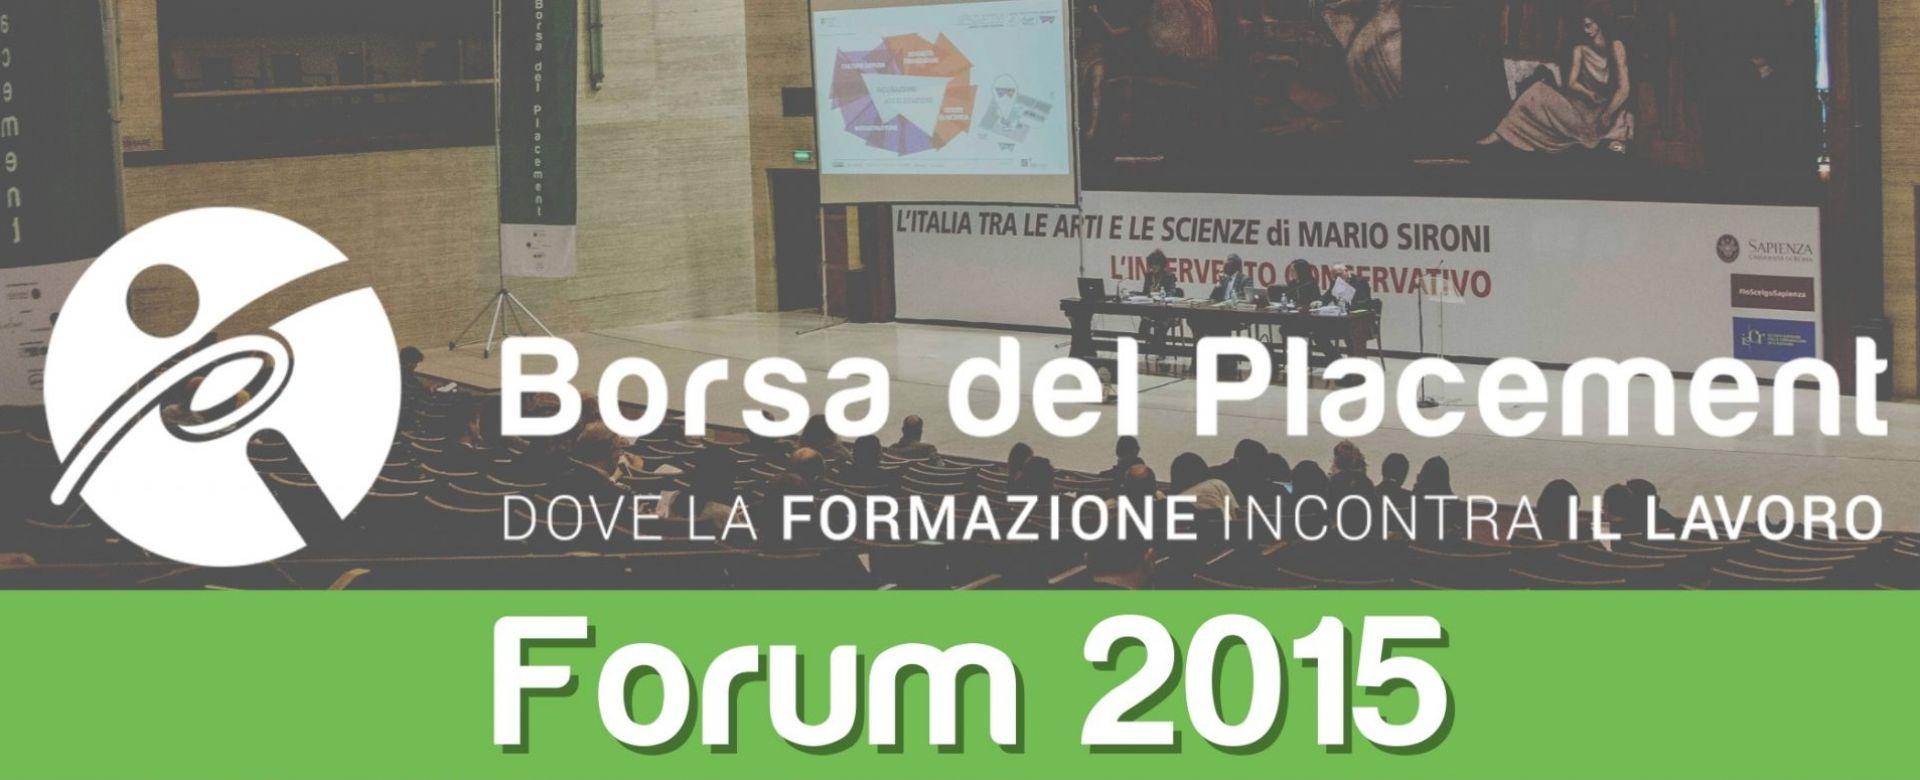 31.10.2015 - Borsa del Placement | IX Forum